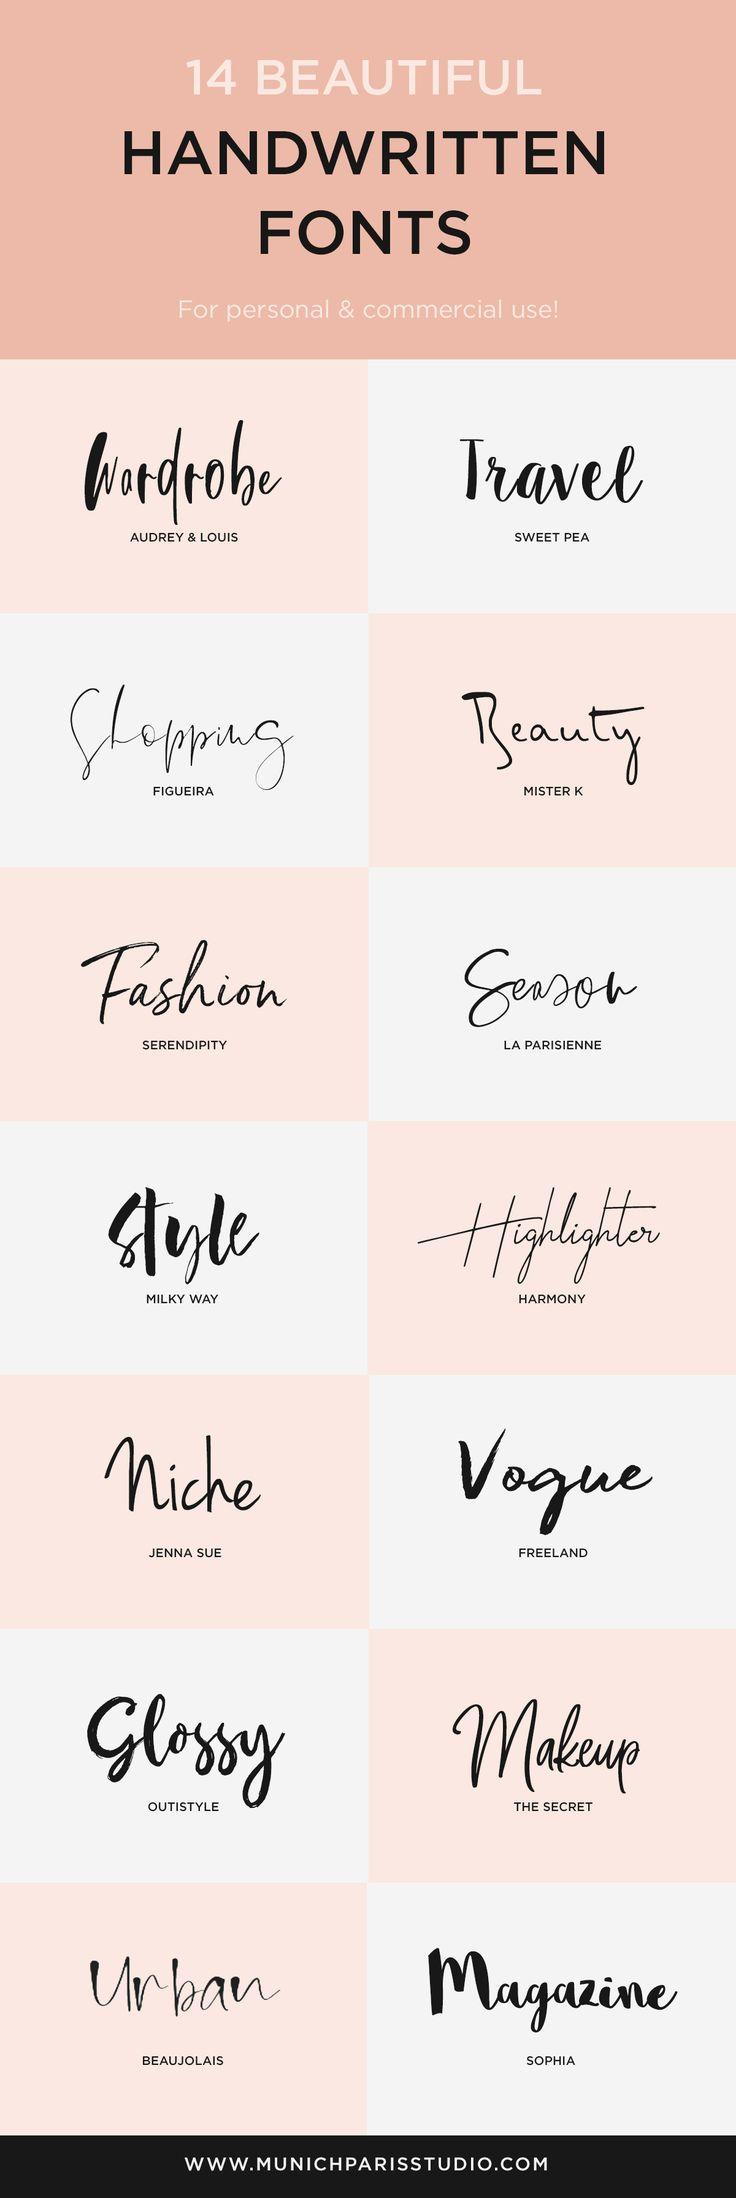 14 Beautiful Hand-Lettered Fonts for Logo & Branding